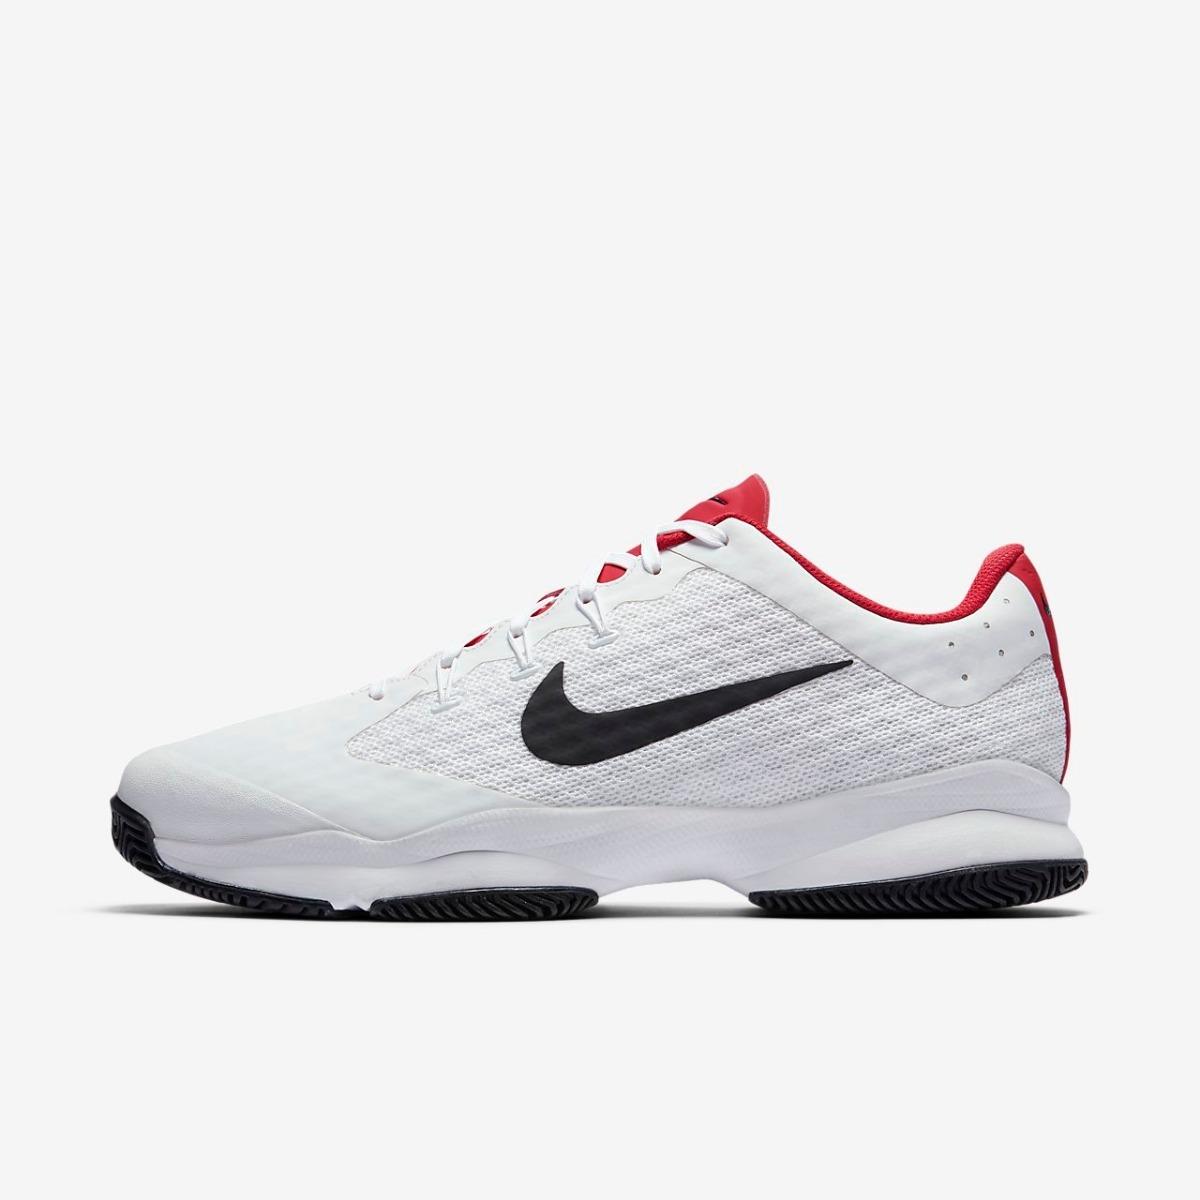 Nike Air Zoom Ultra Tenis Padel. Hombre. 845007-116 -   2.990 2b9f847be9e3a